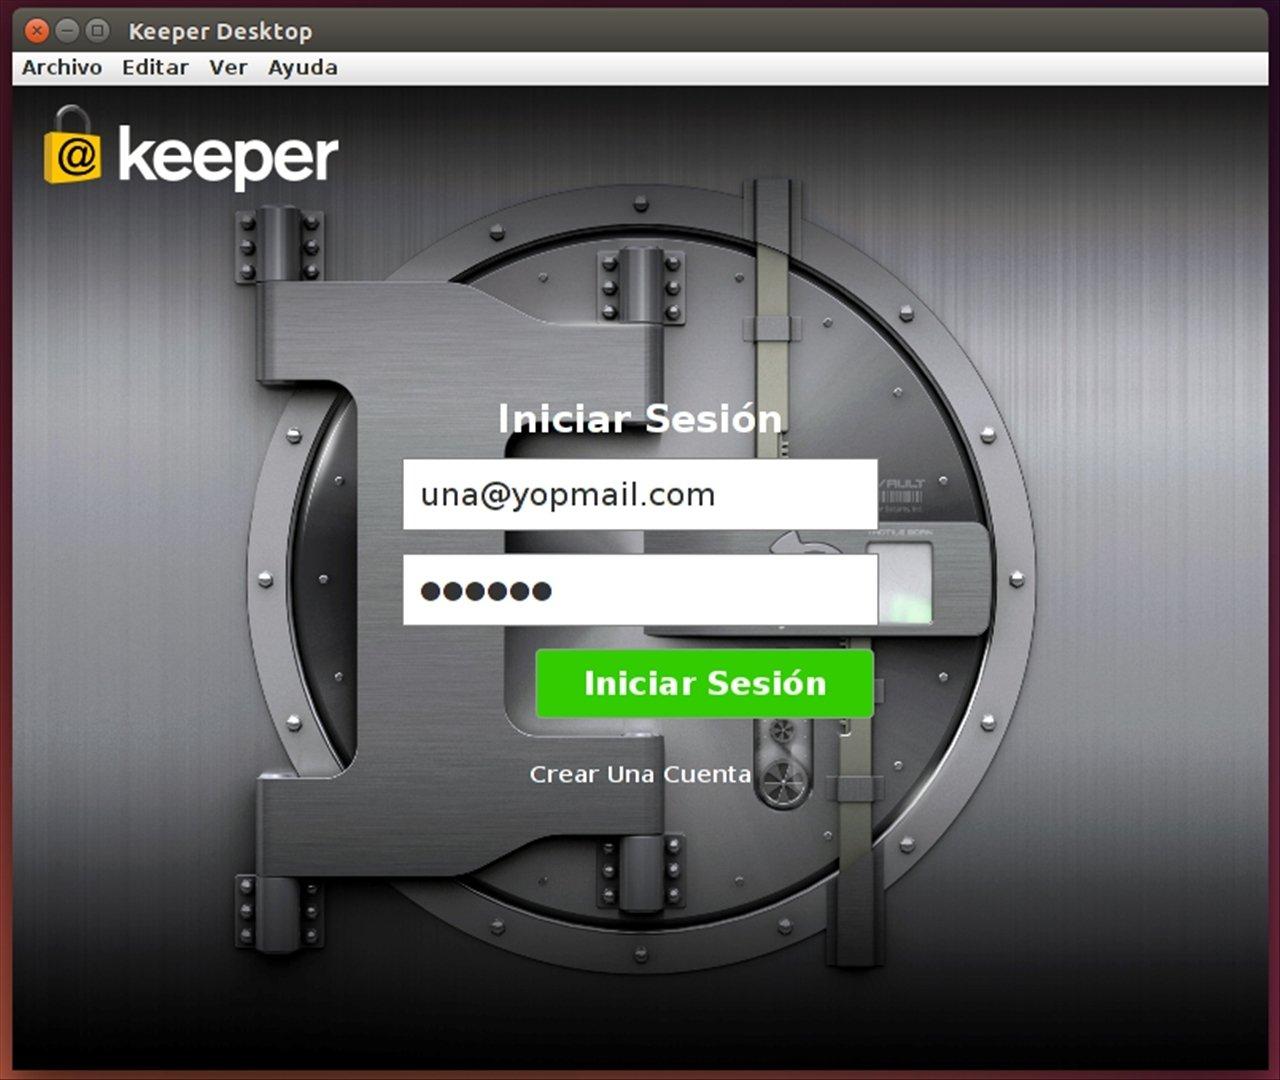 Keeper Linux image 6